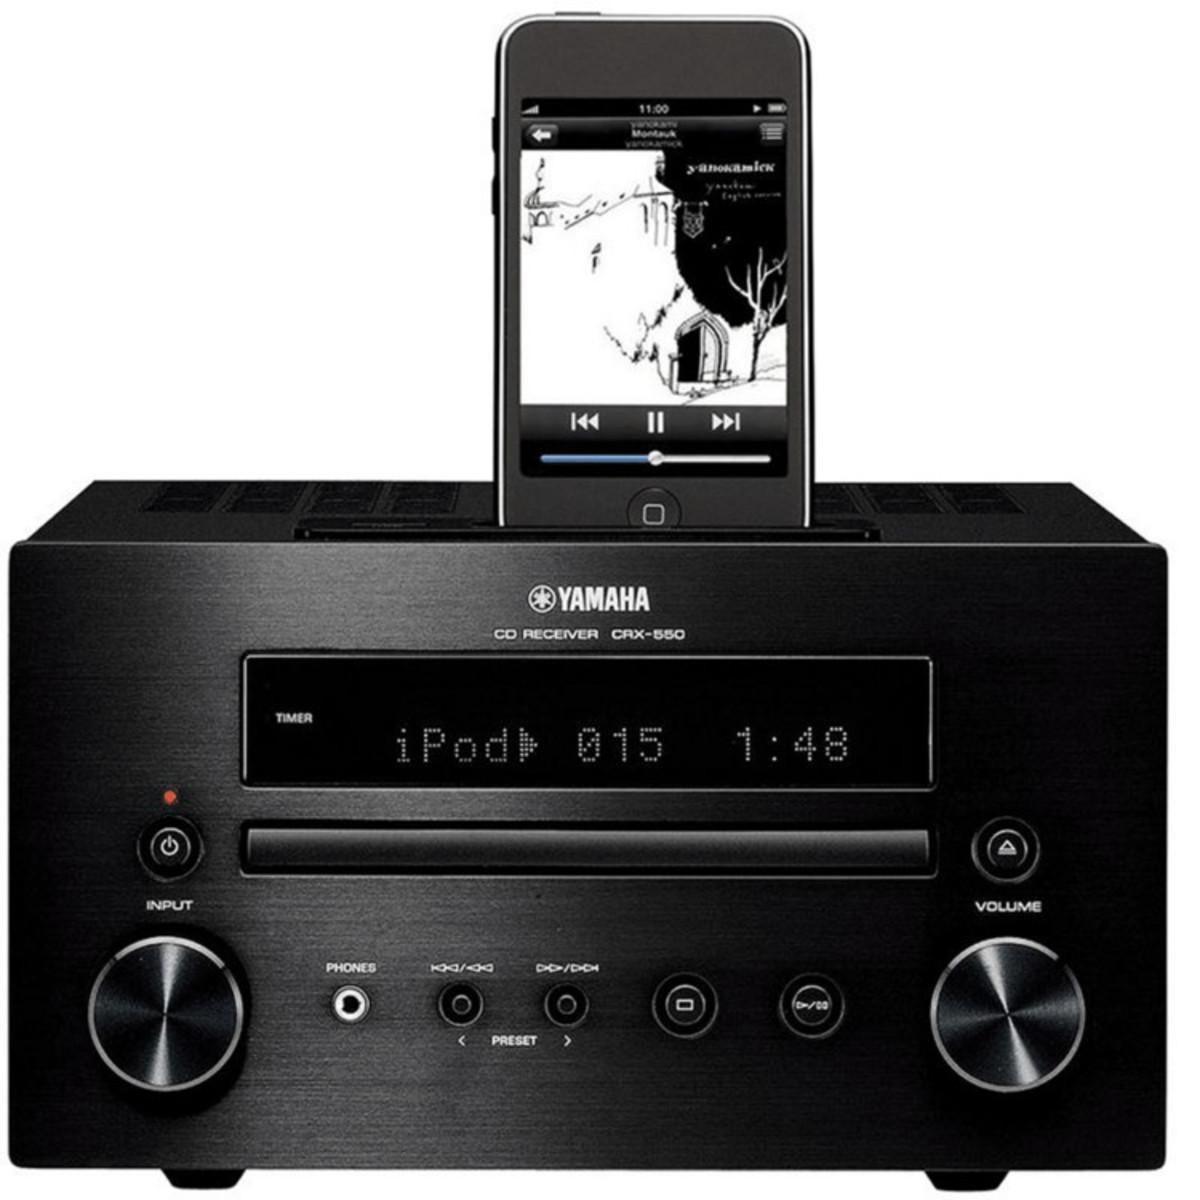 Yamaha crx 550 mini sound system with ipod dock black for Yamaha sound system